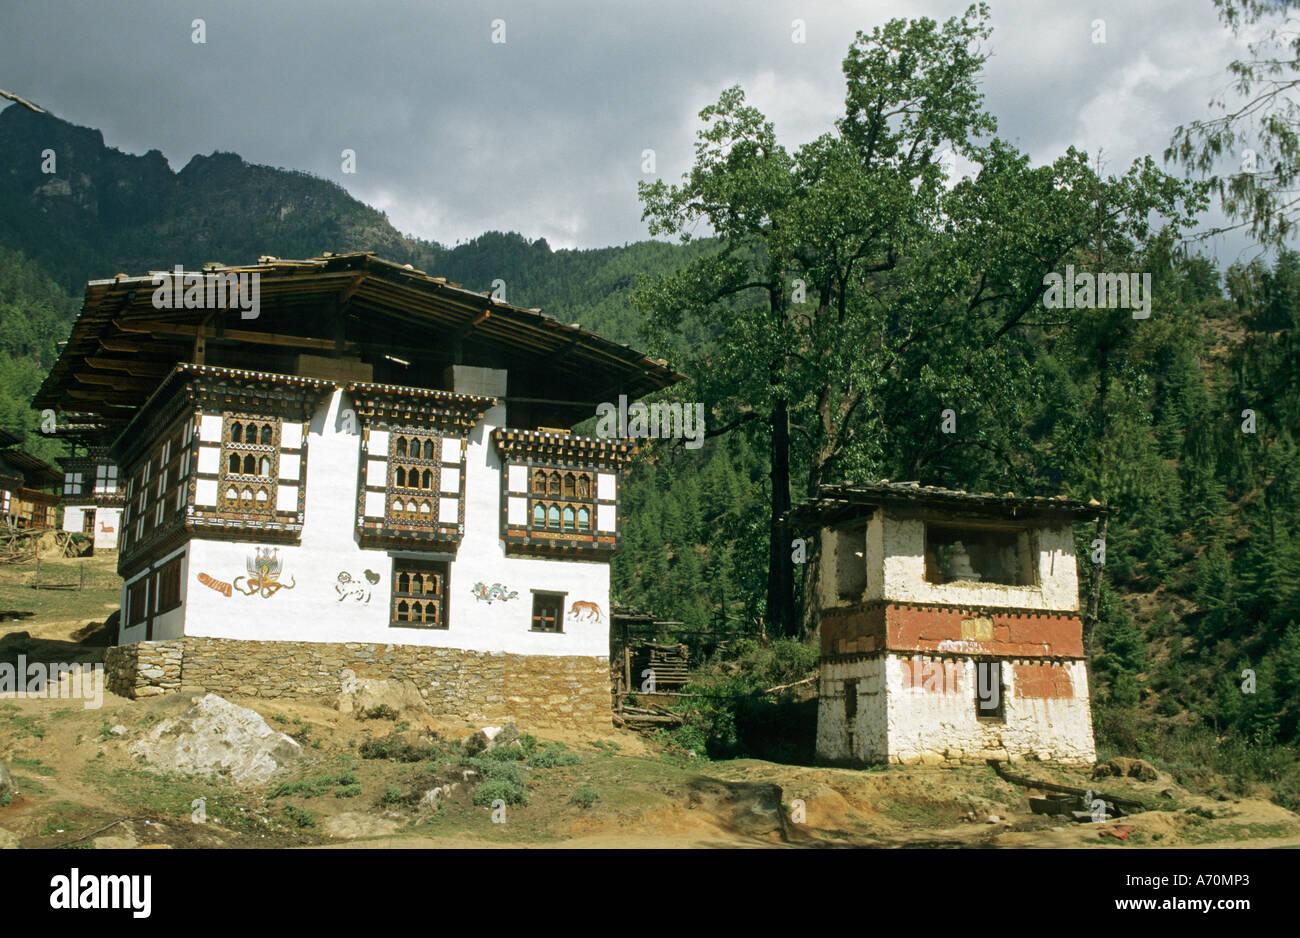 Rahmen-Häuser in buthan Stockfoto, Bild: 6677346 - Alamy